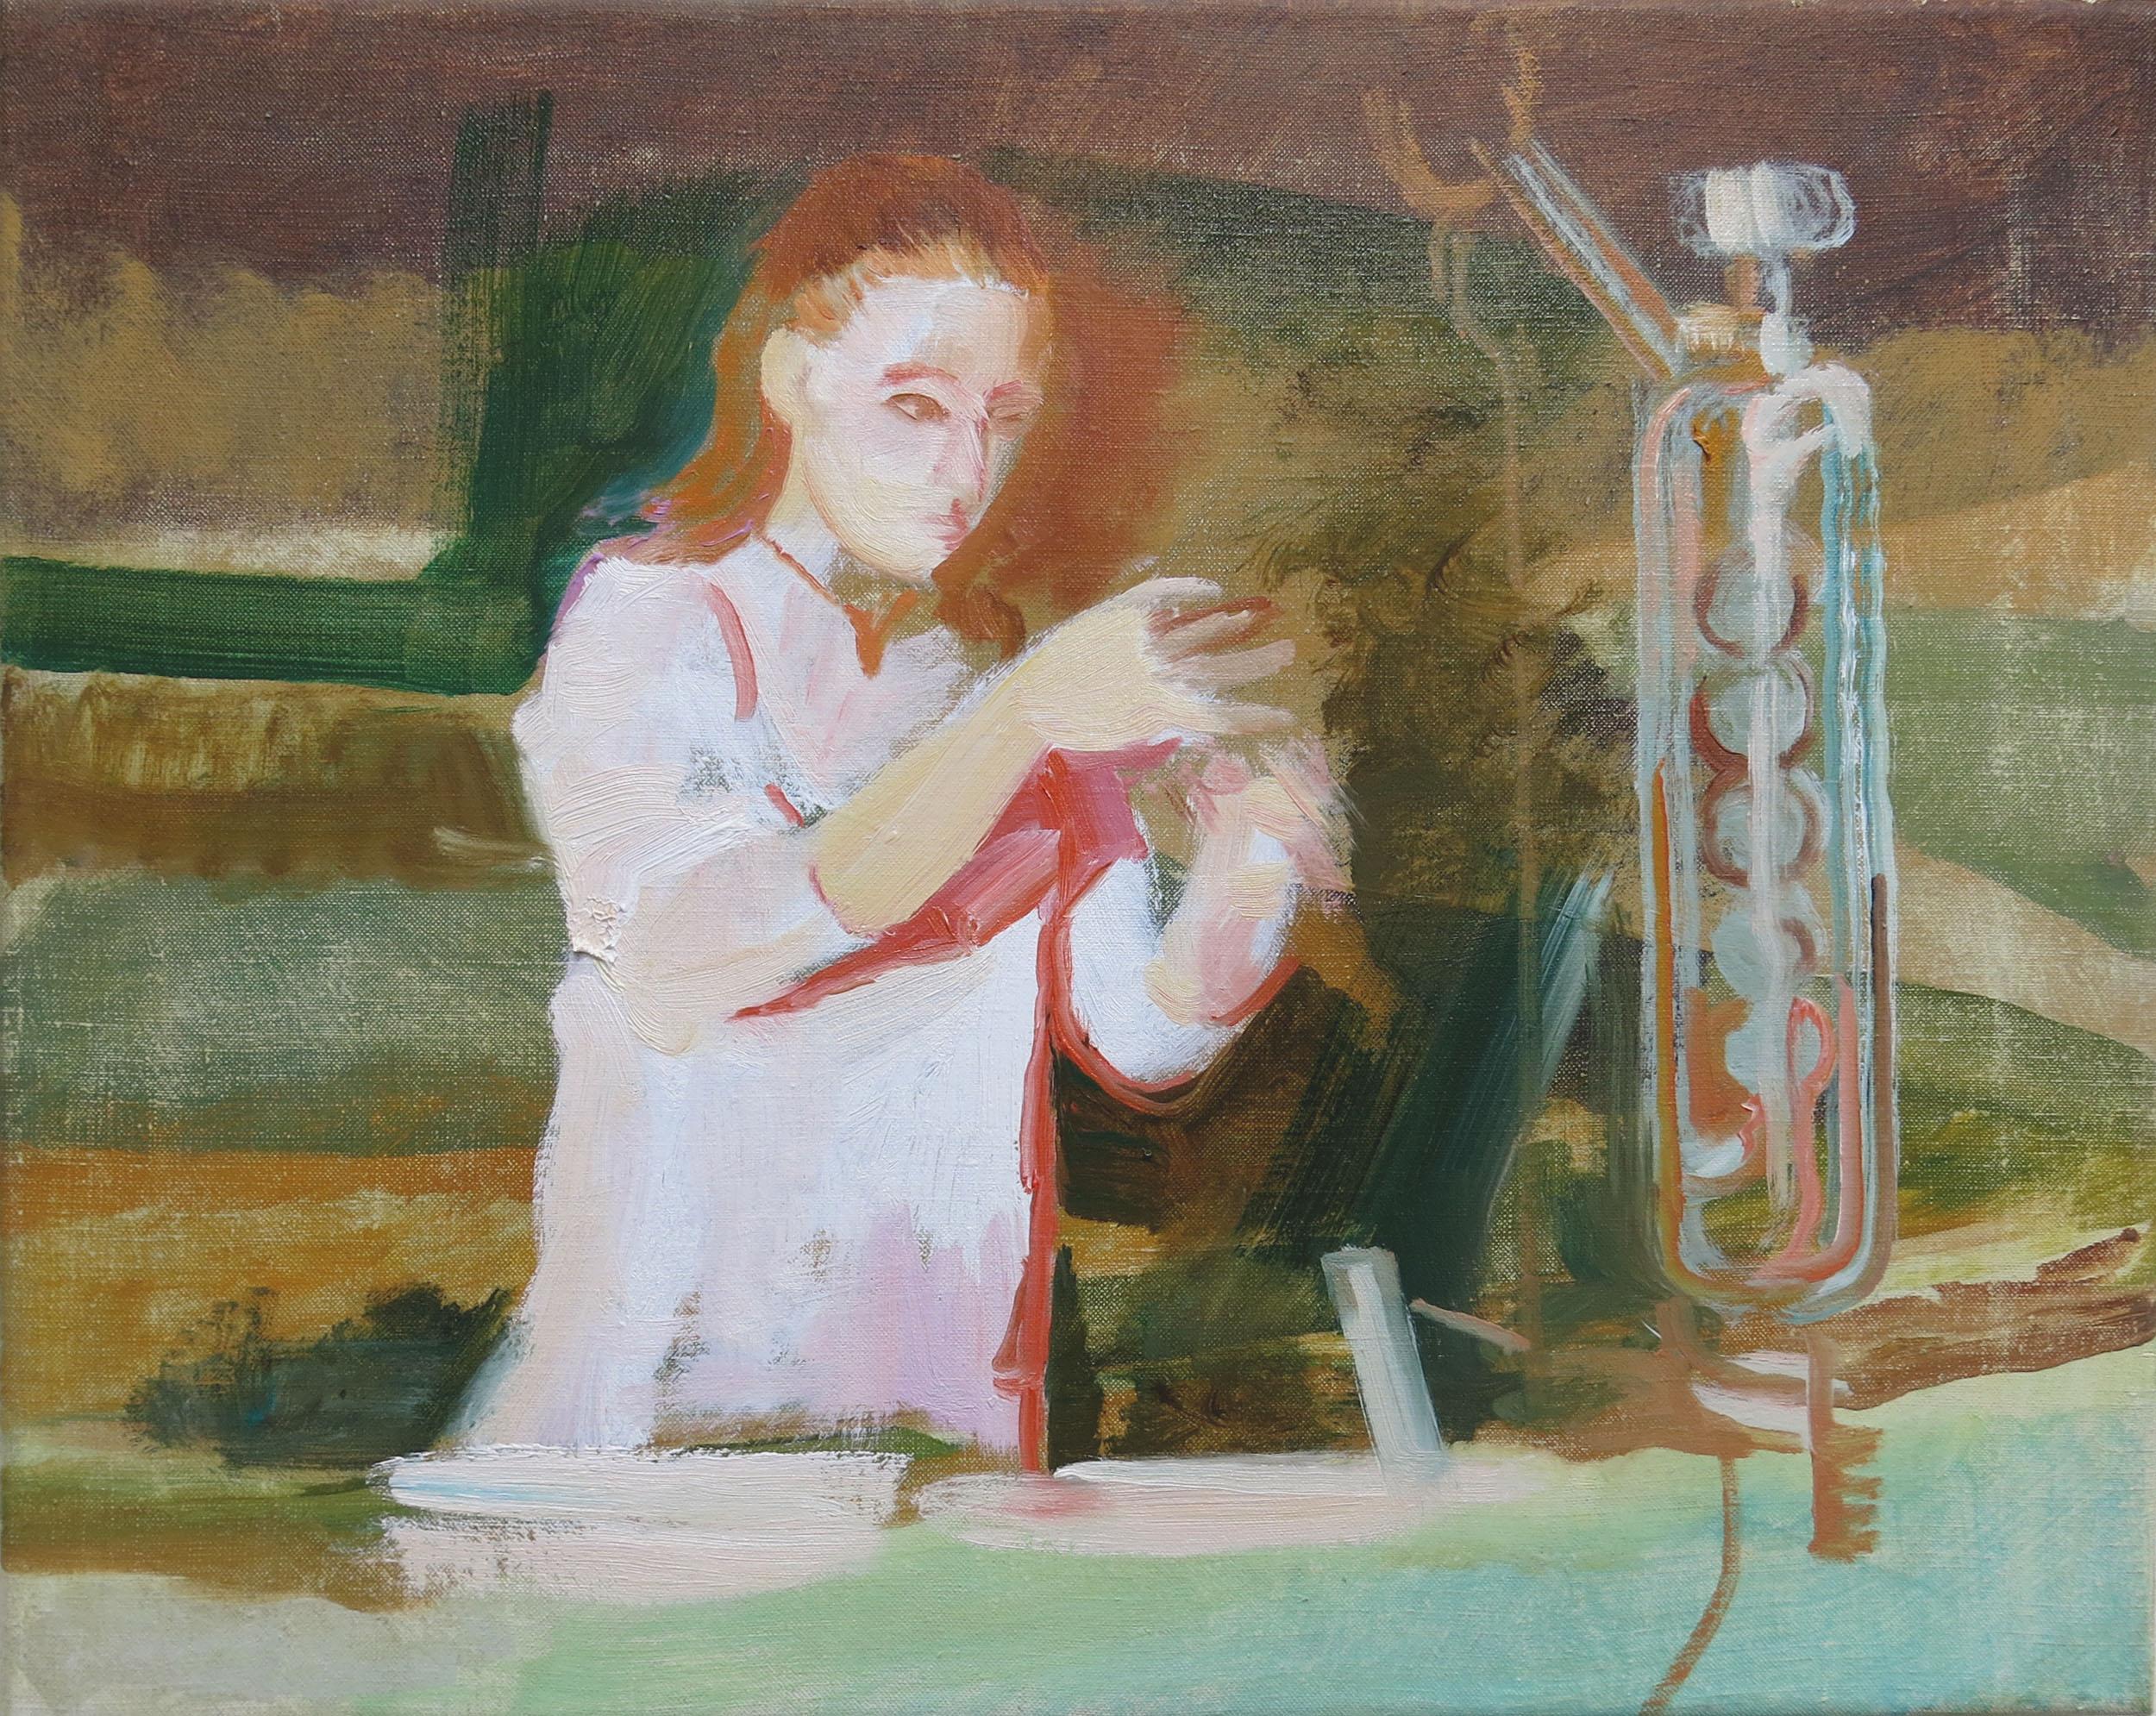 Robin Dixon. Chemist - oil on canvas 2018 45 x 55 cm.jpg